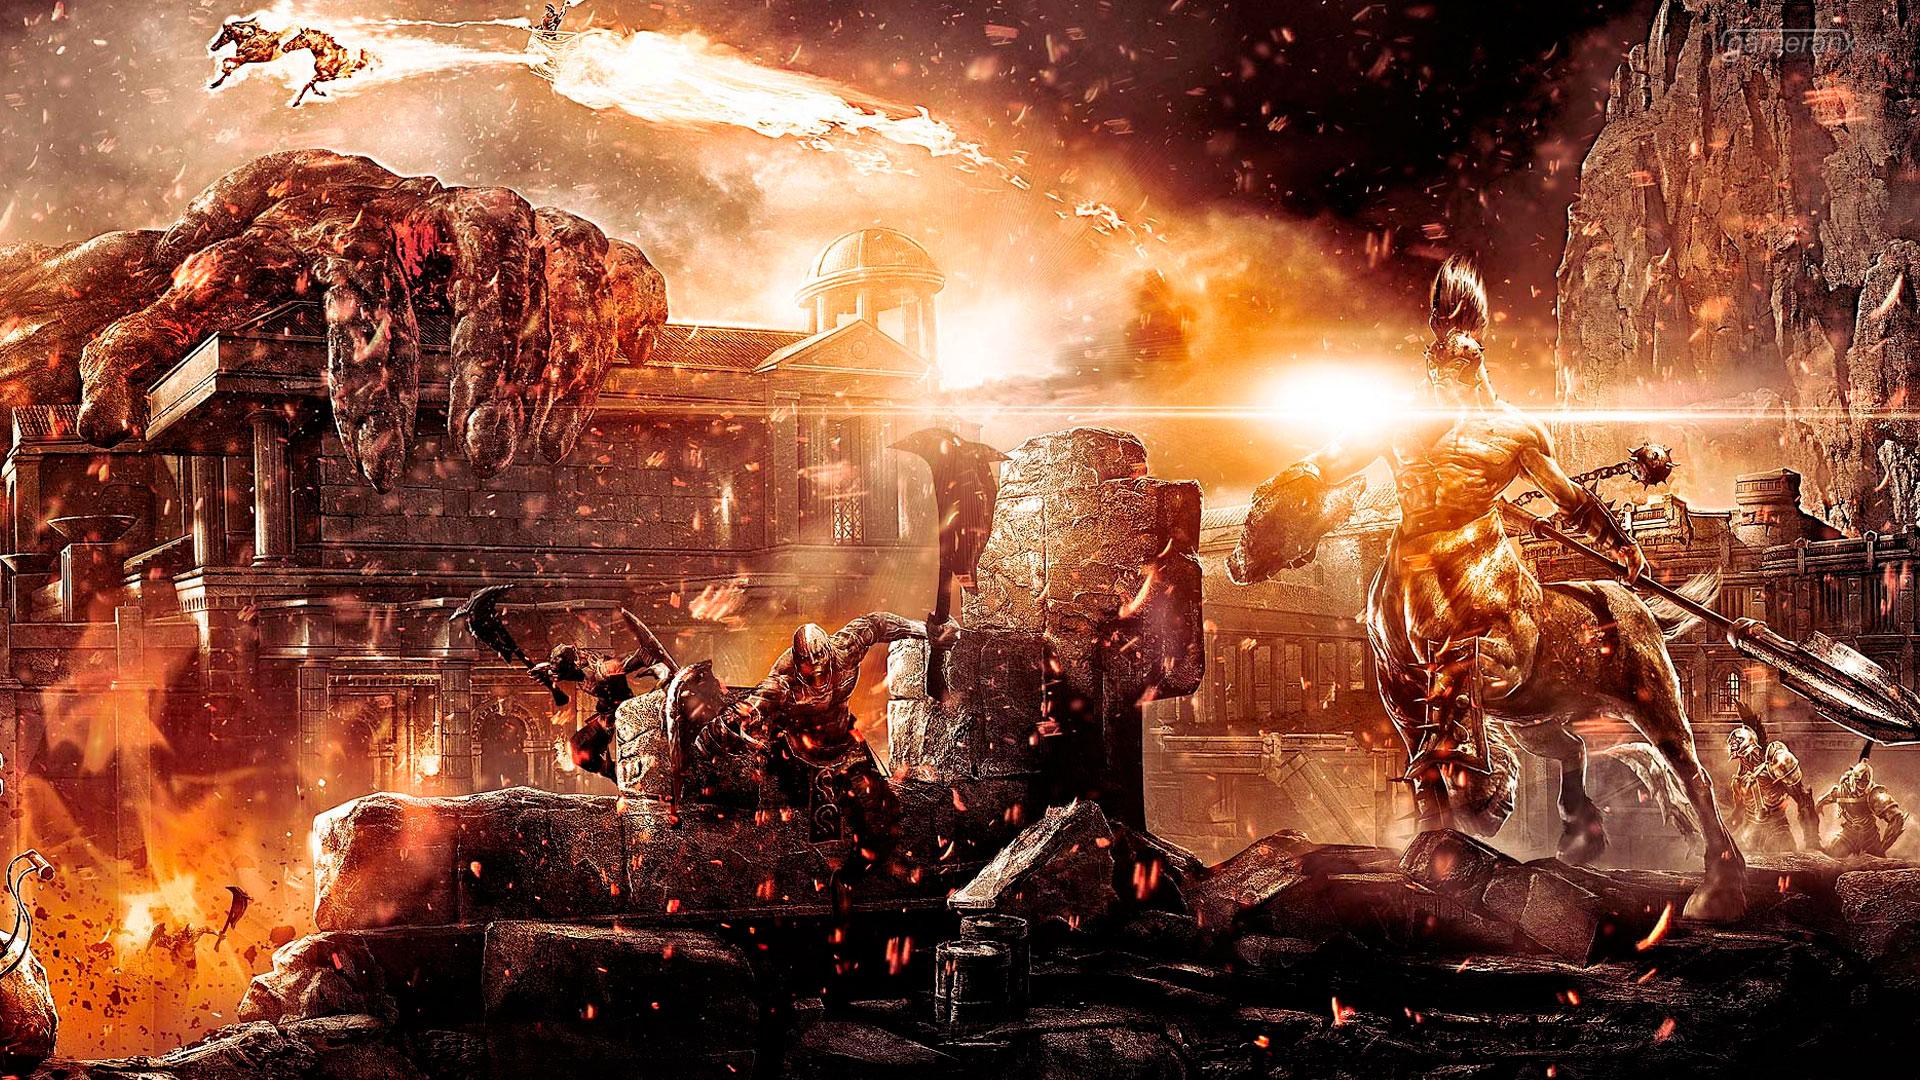 God of War III 1080p Wallpaper God of War III 720p Wallpaper 1920x1080